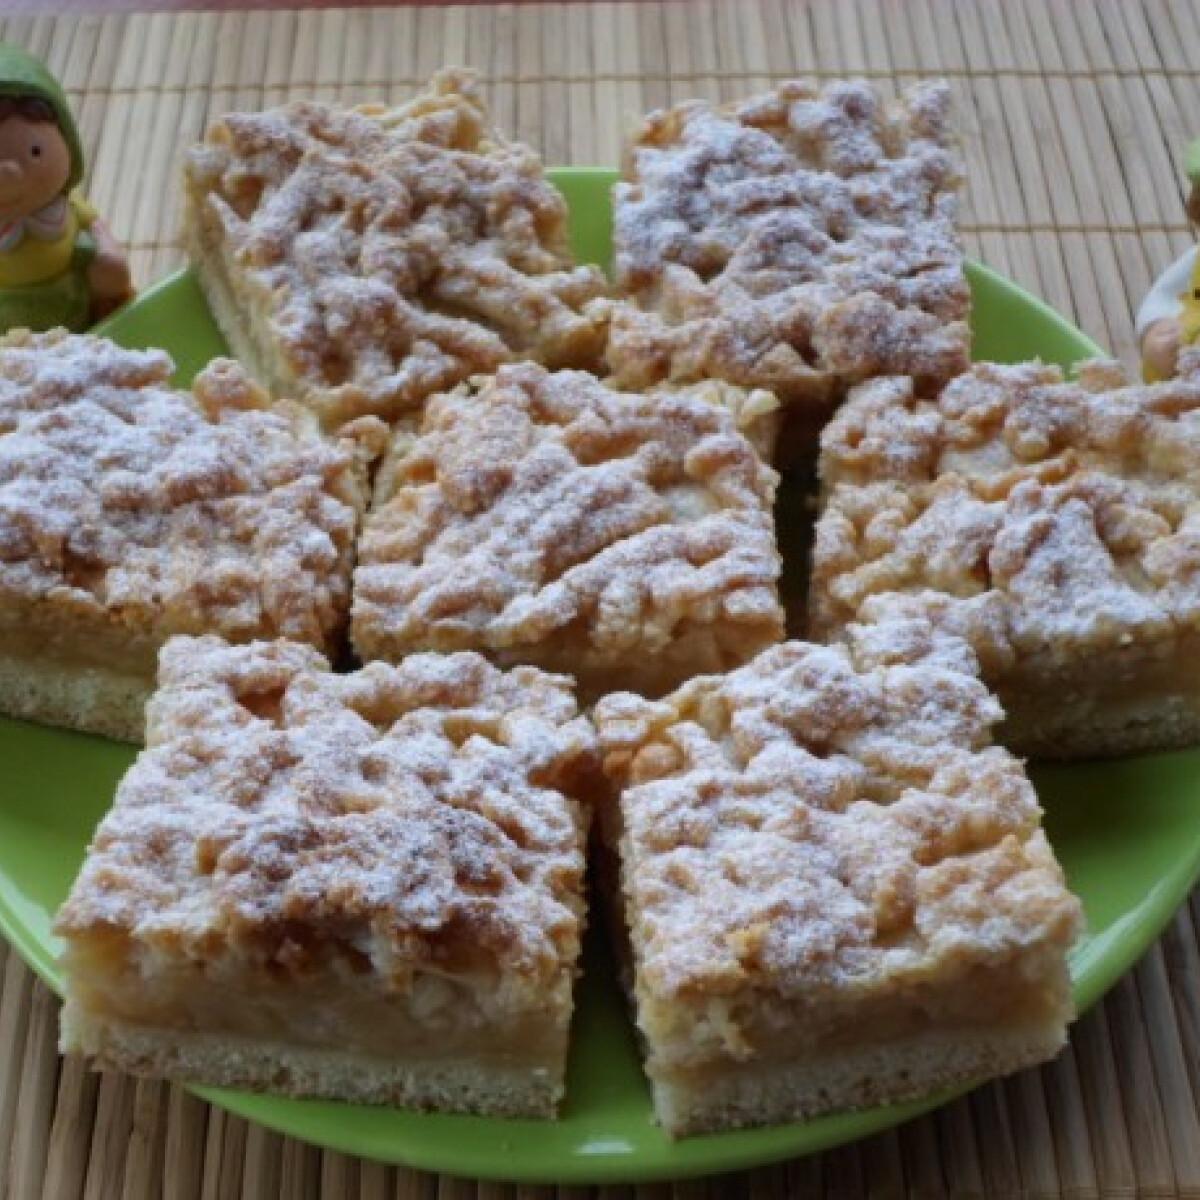 Pihe-puha almás süti